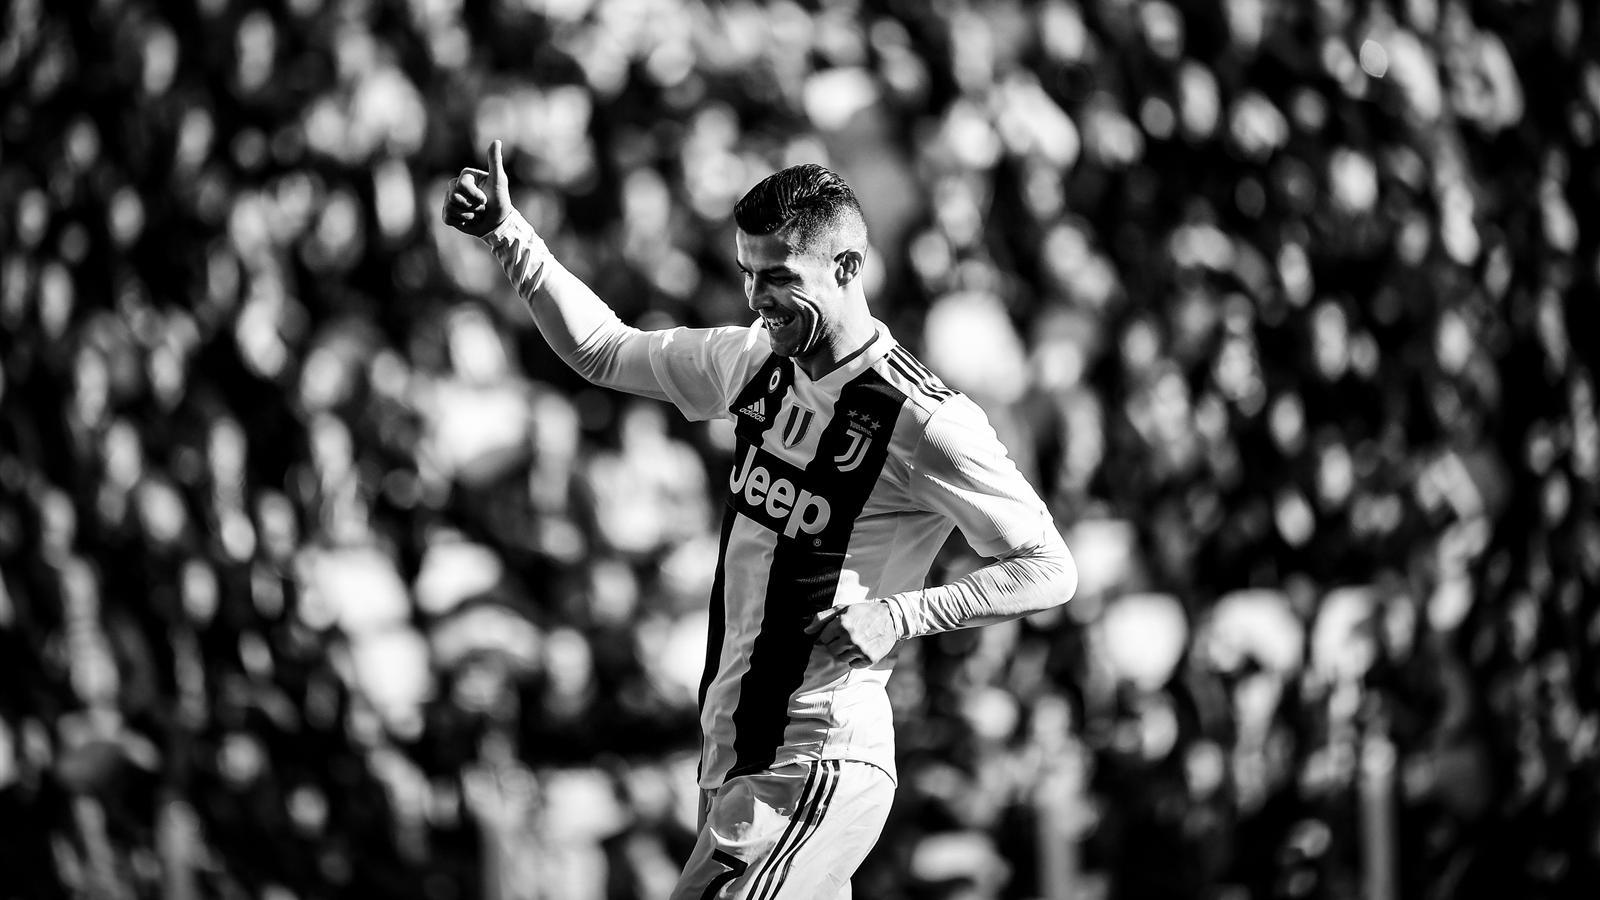 Cristiano Ronaldo - Player Profile - Football - Eurosport a6caee494fba8